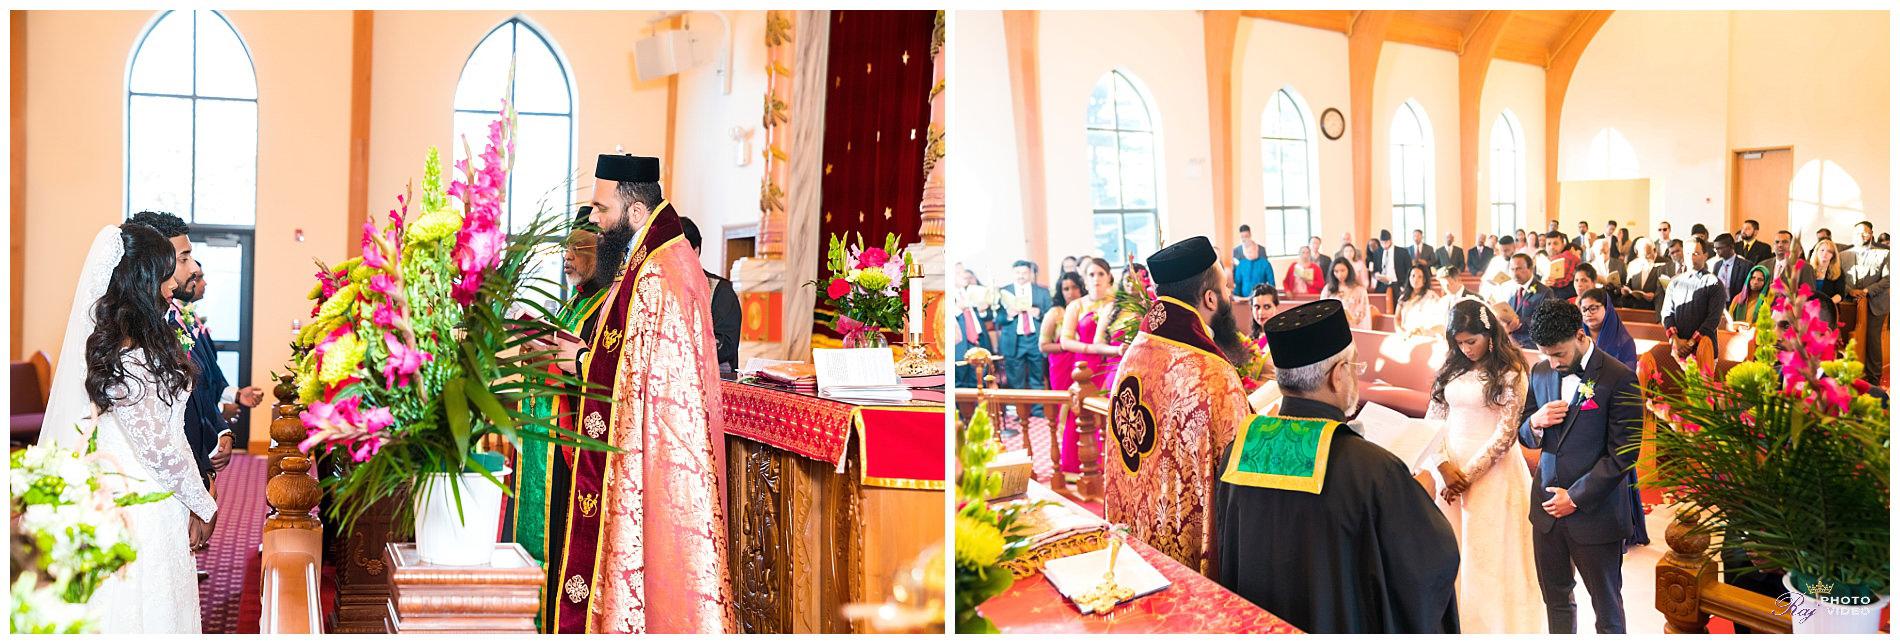 Royal Alberts Palace Fords Nj Greek Orthodox Wedding Sibyl Jithin